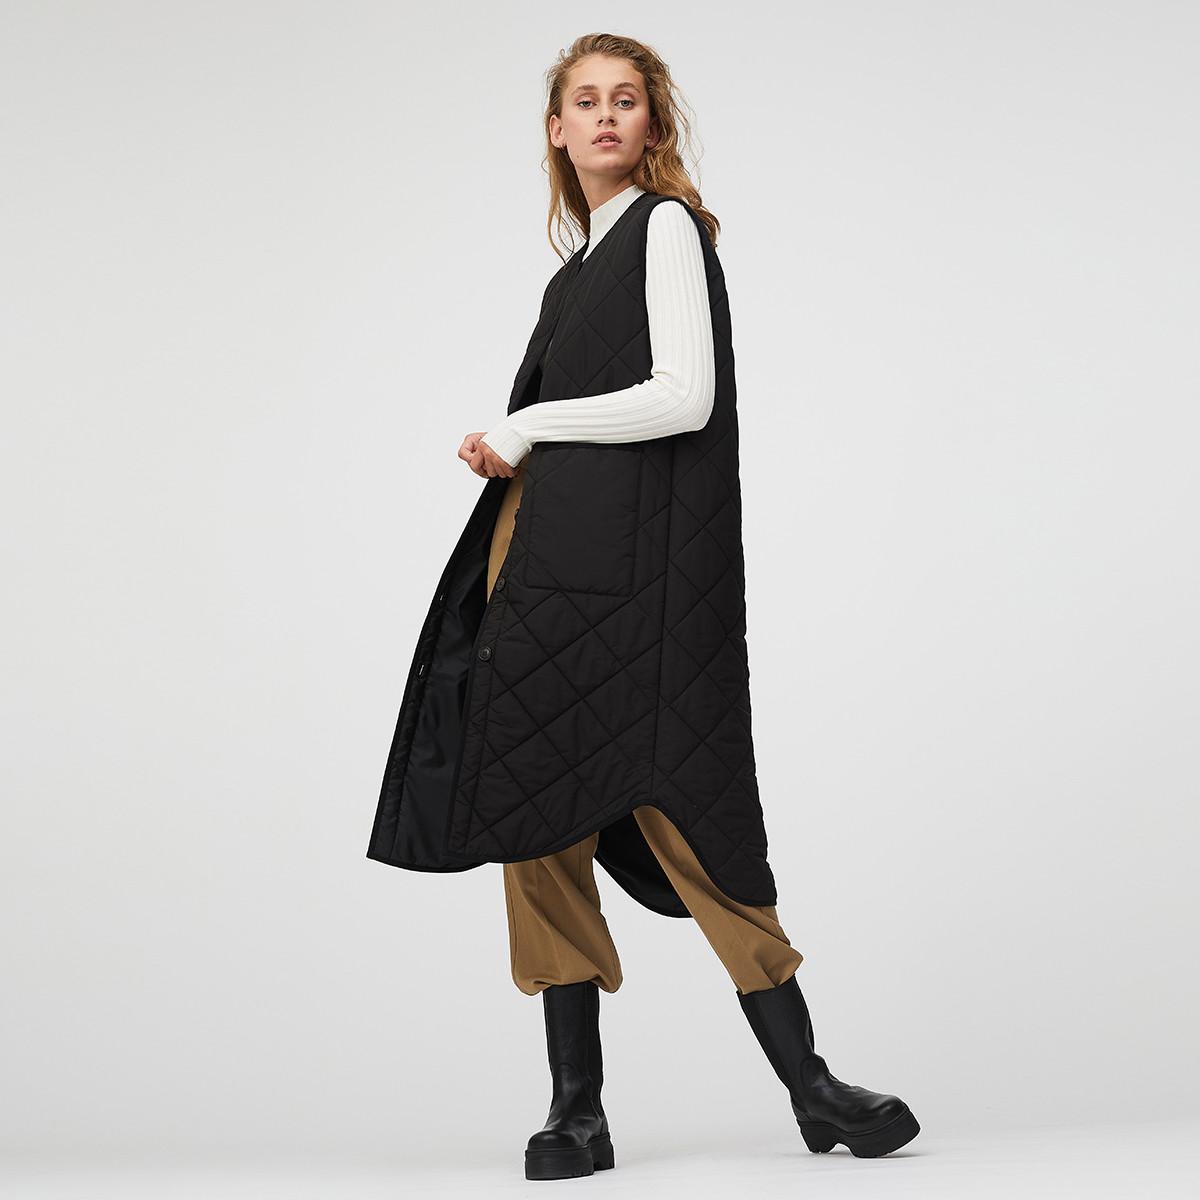 Global Funk Kaison vest, black, x-small